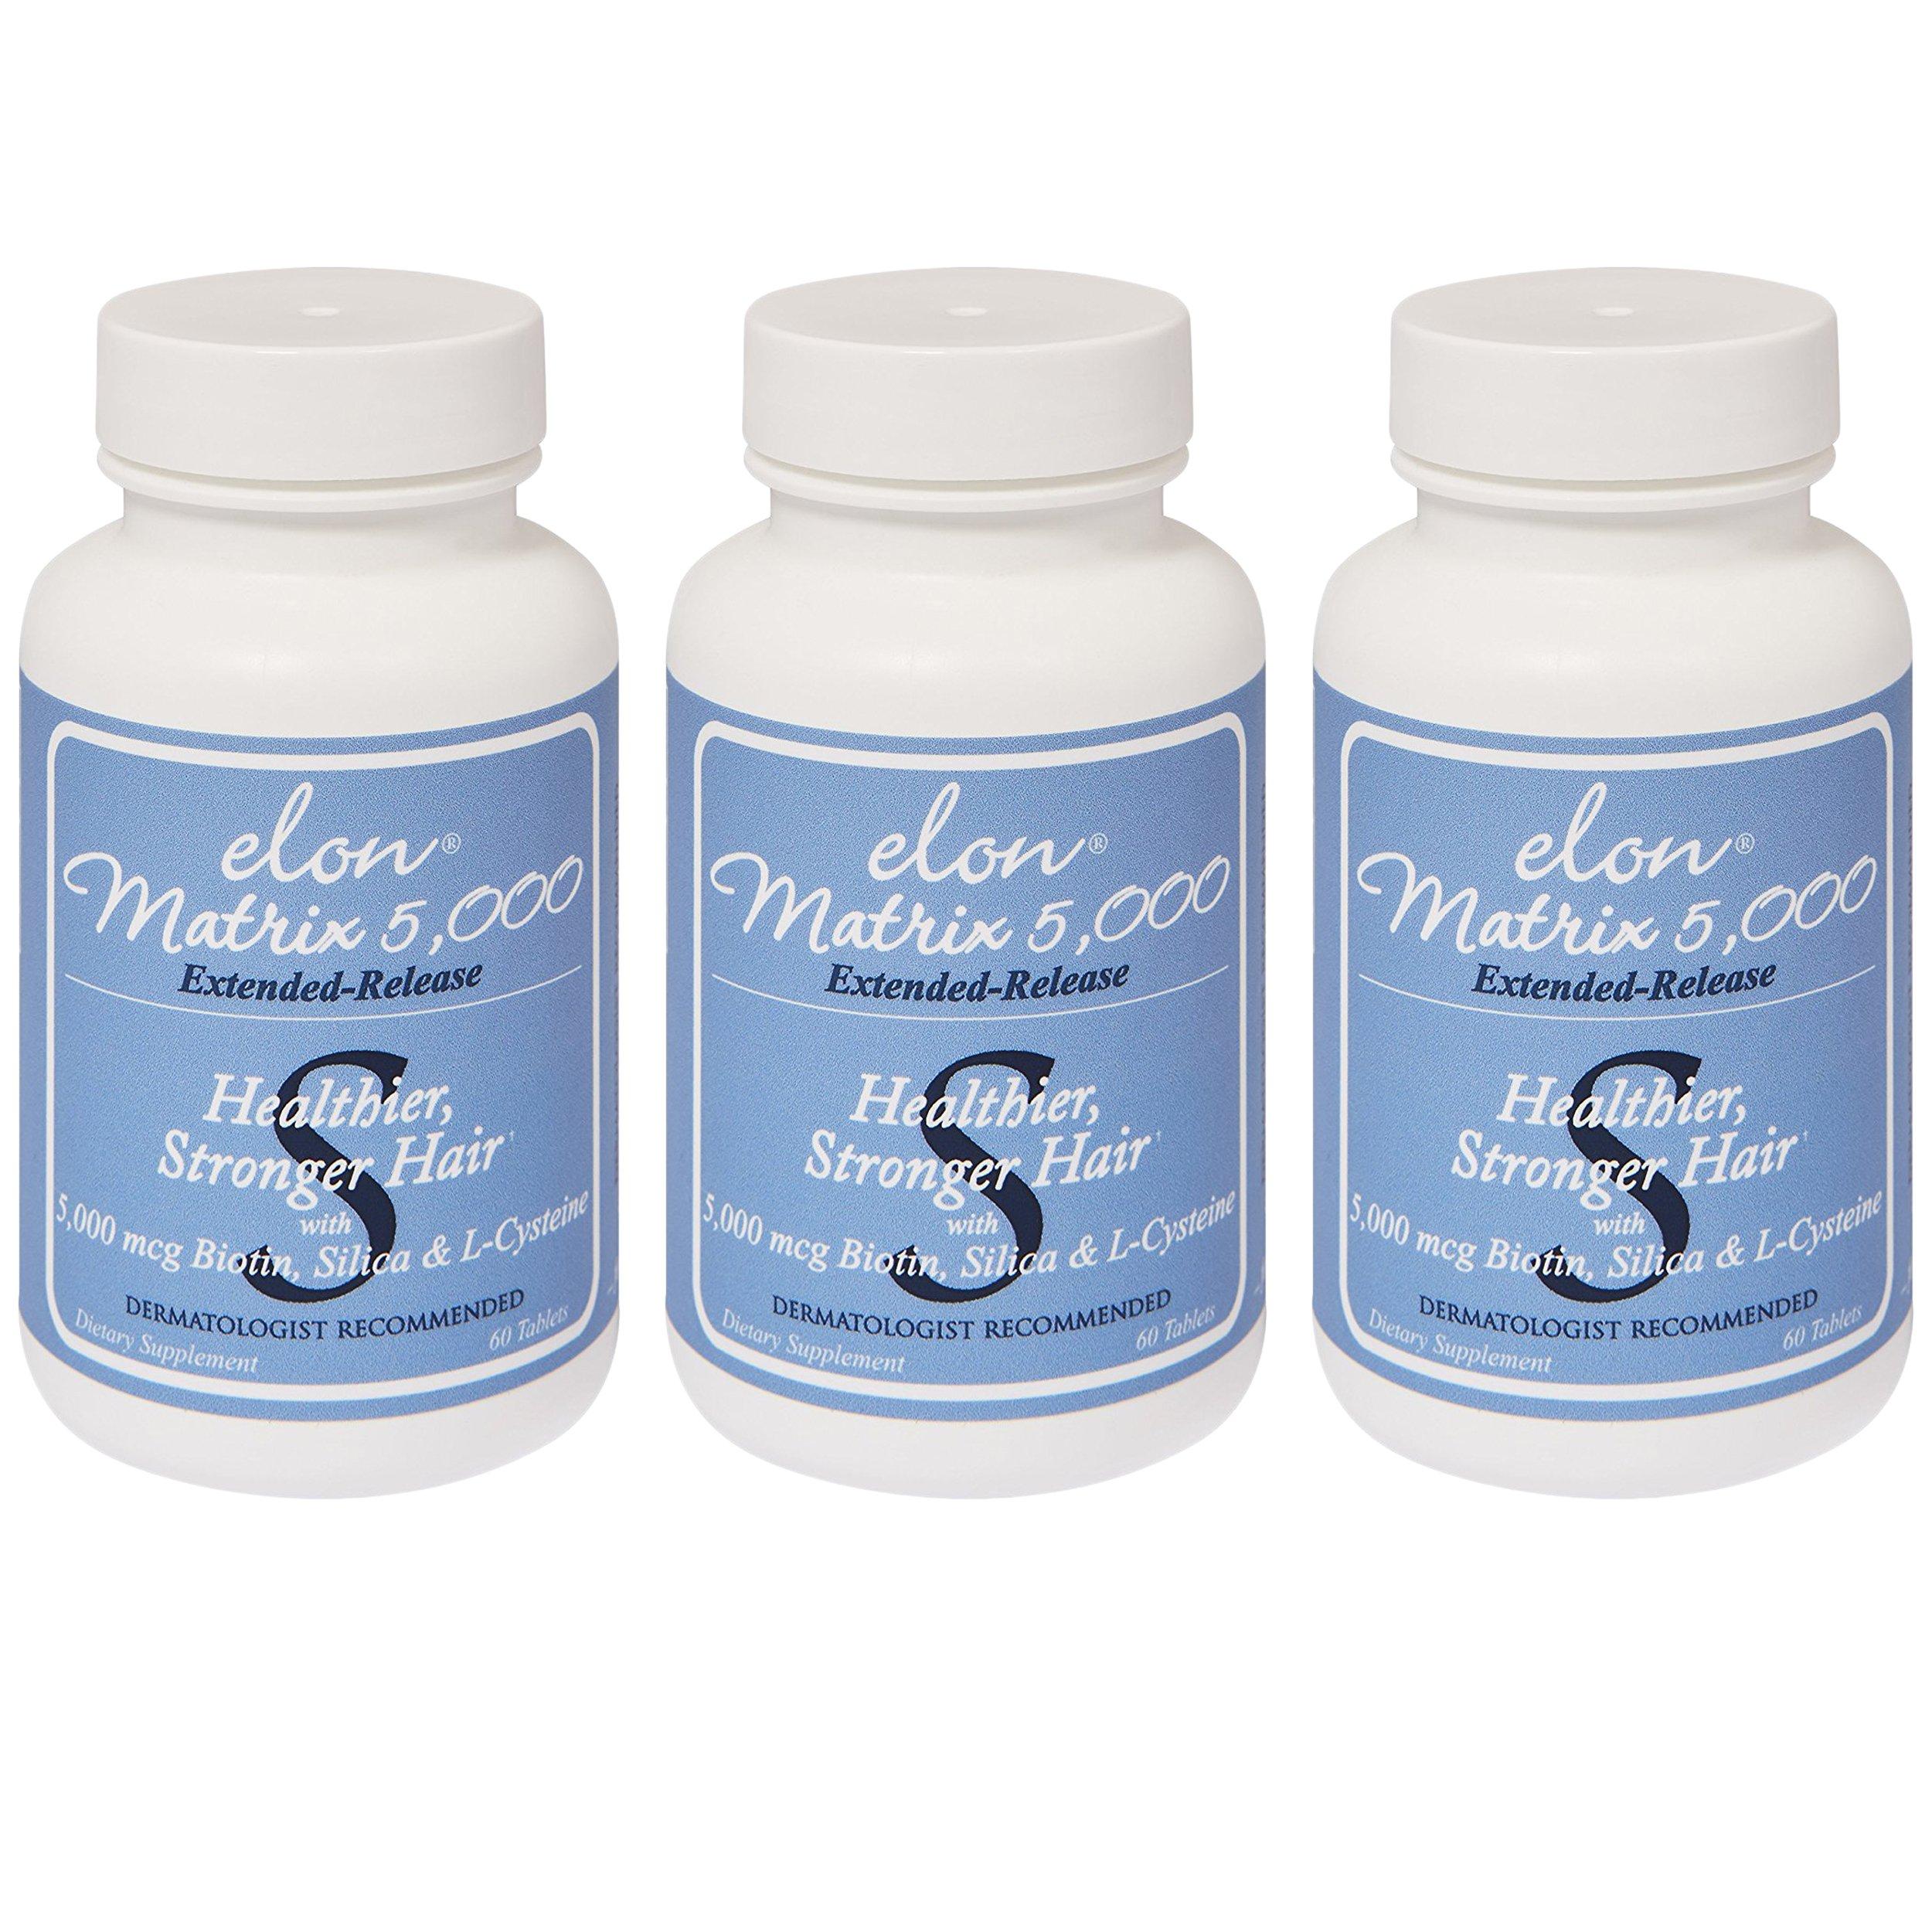 Elon Matrix 5,000 - Vitamin for Hair 60 capsules (3 Pack)